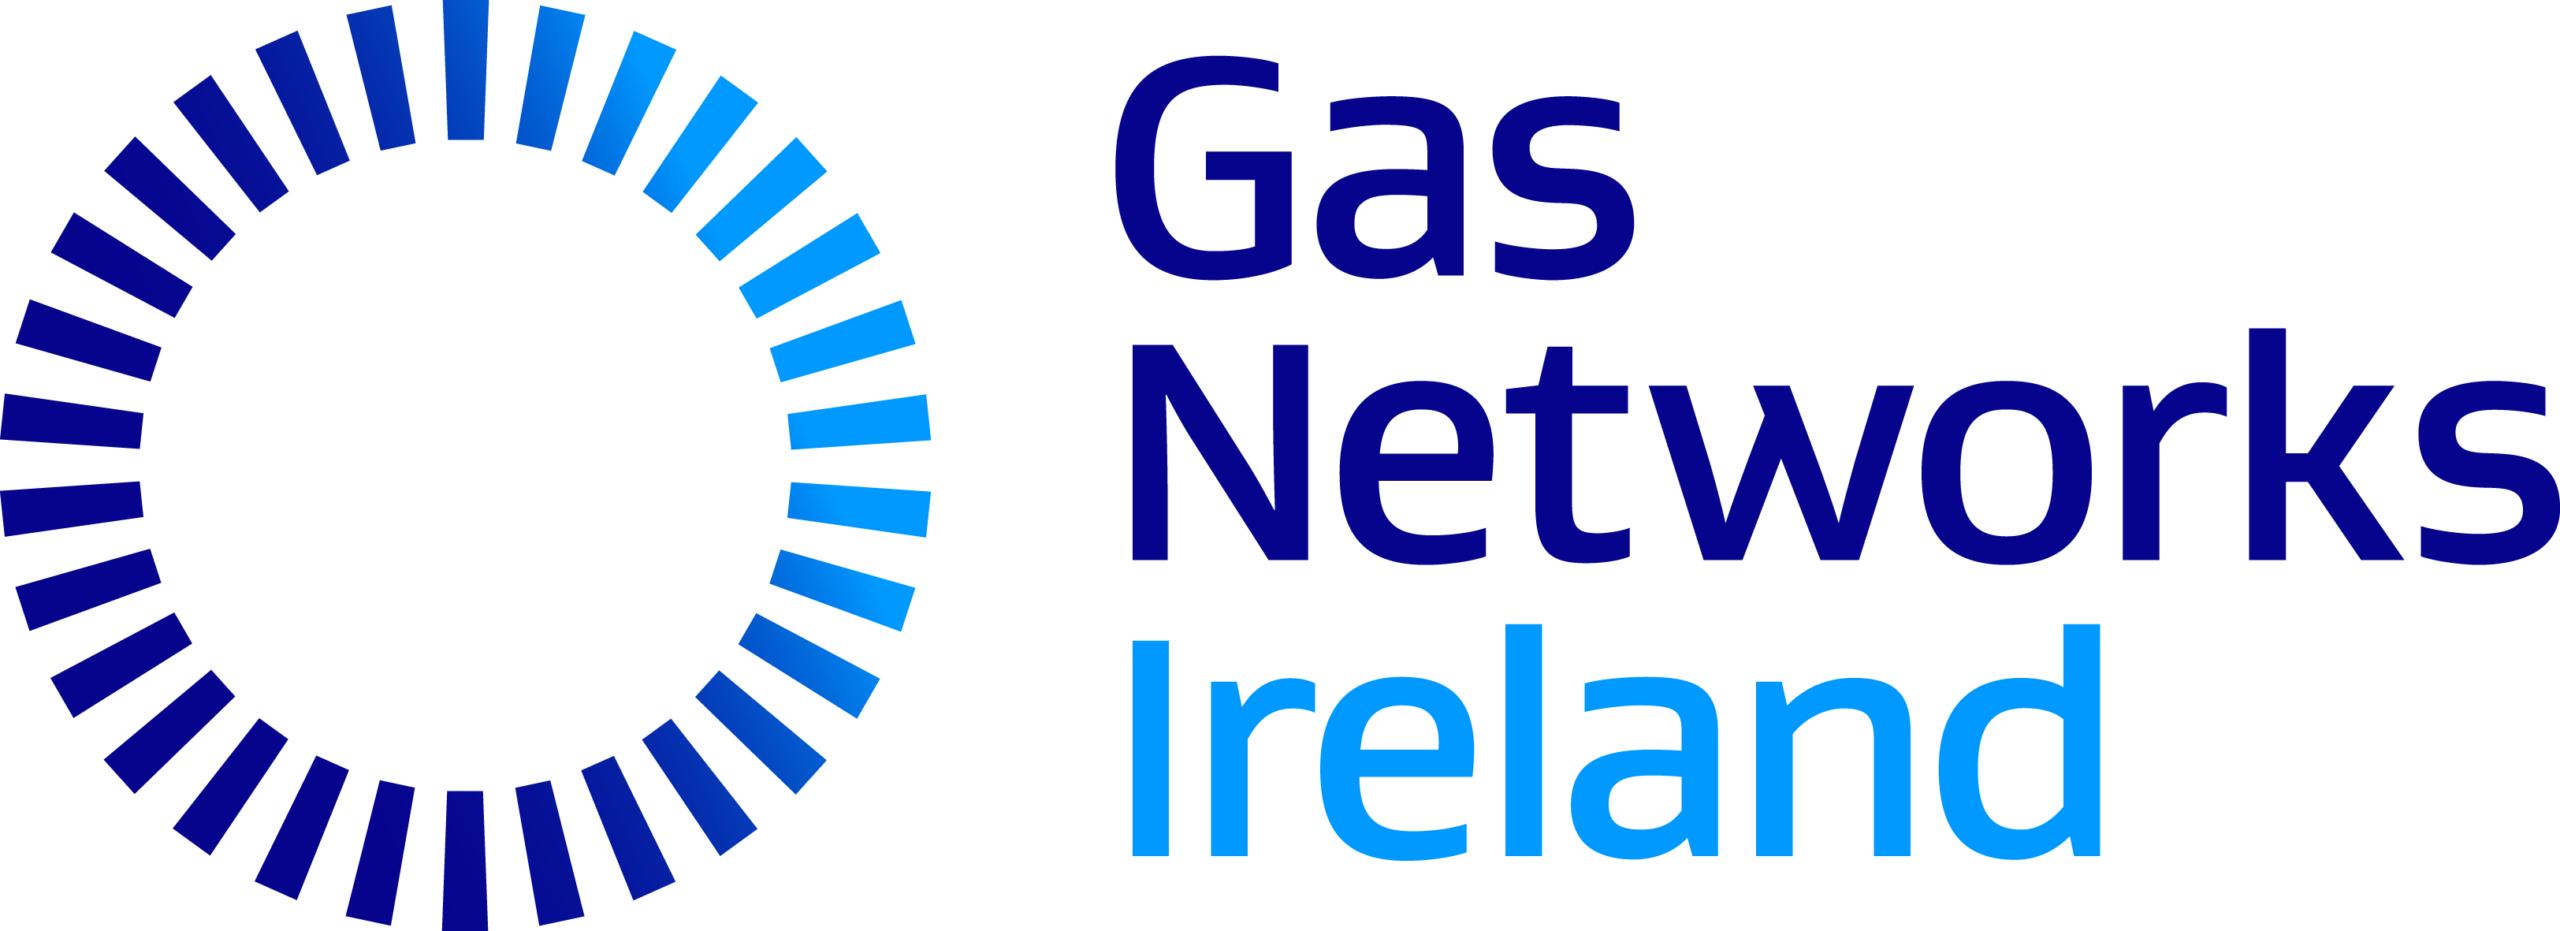 Gas Networks Ireland logo